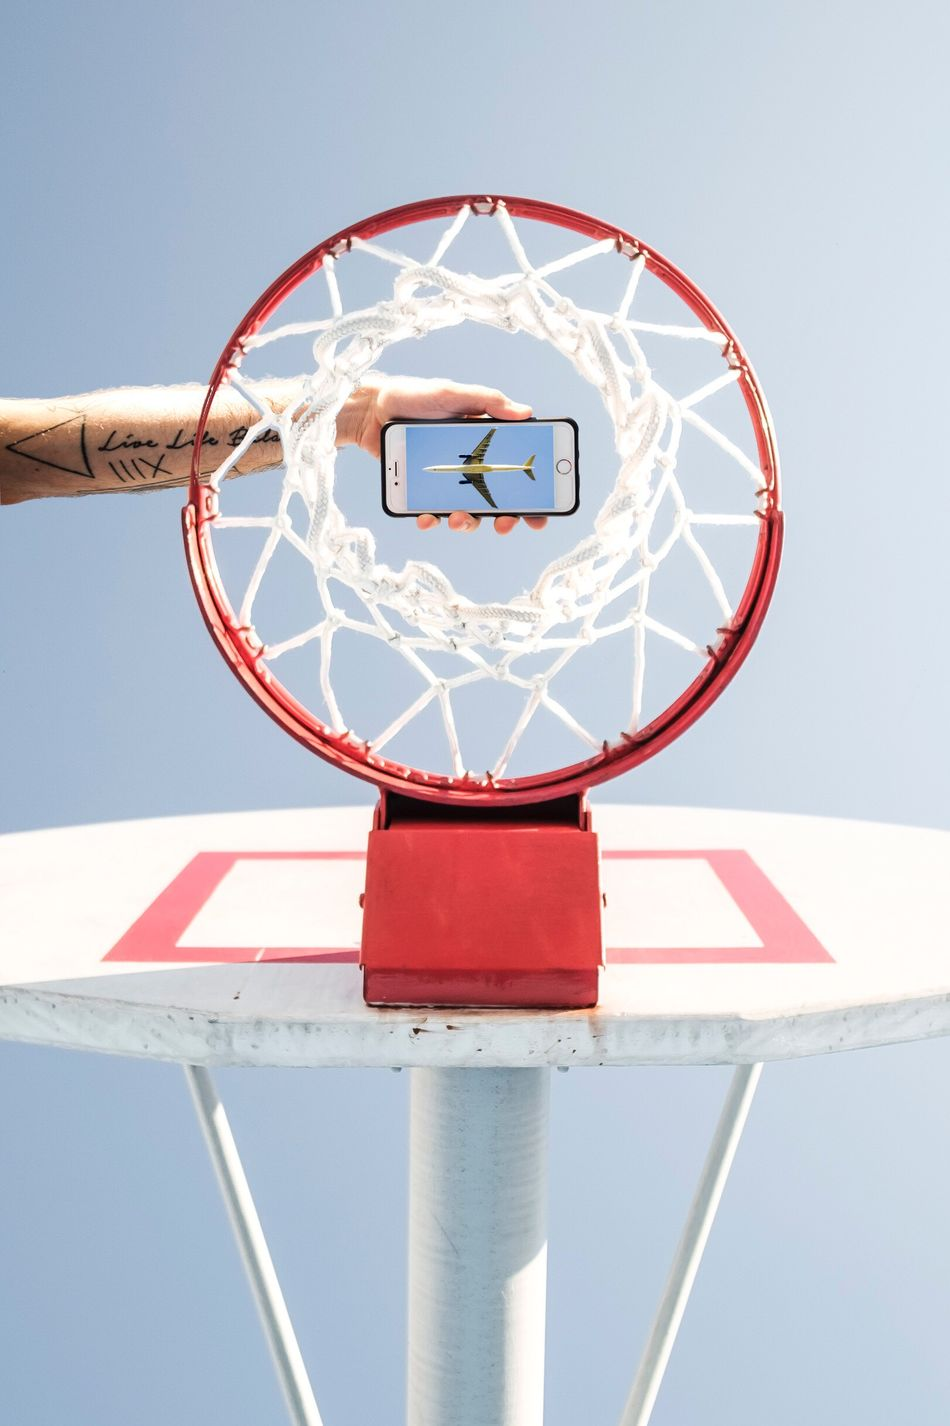 Beautiful stock photos of flugzeug, Airplane, Basketball - Sport, Basketball Hoop, Circle